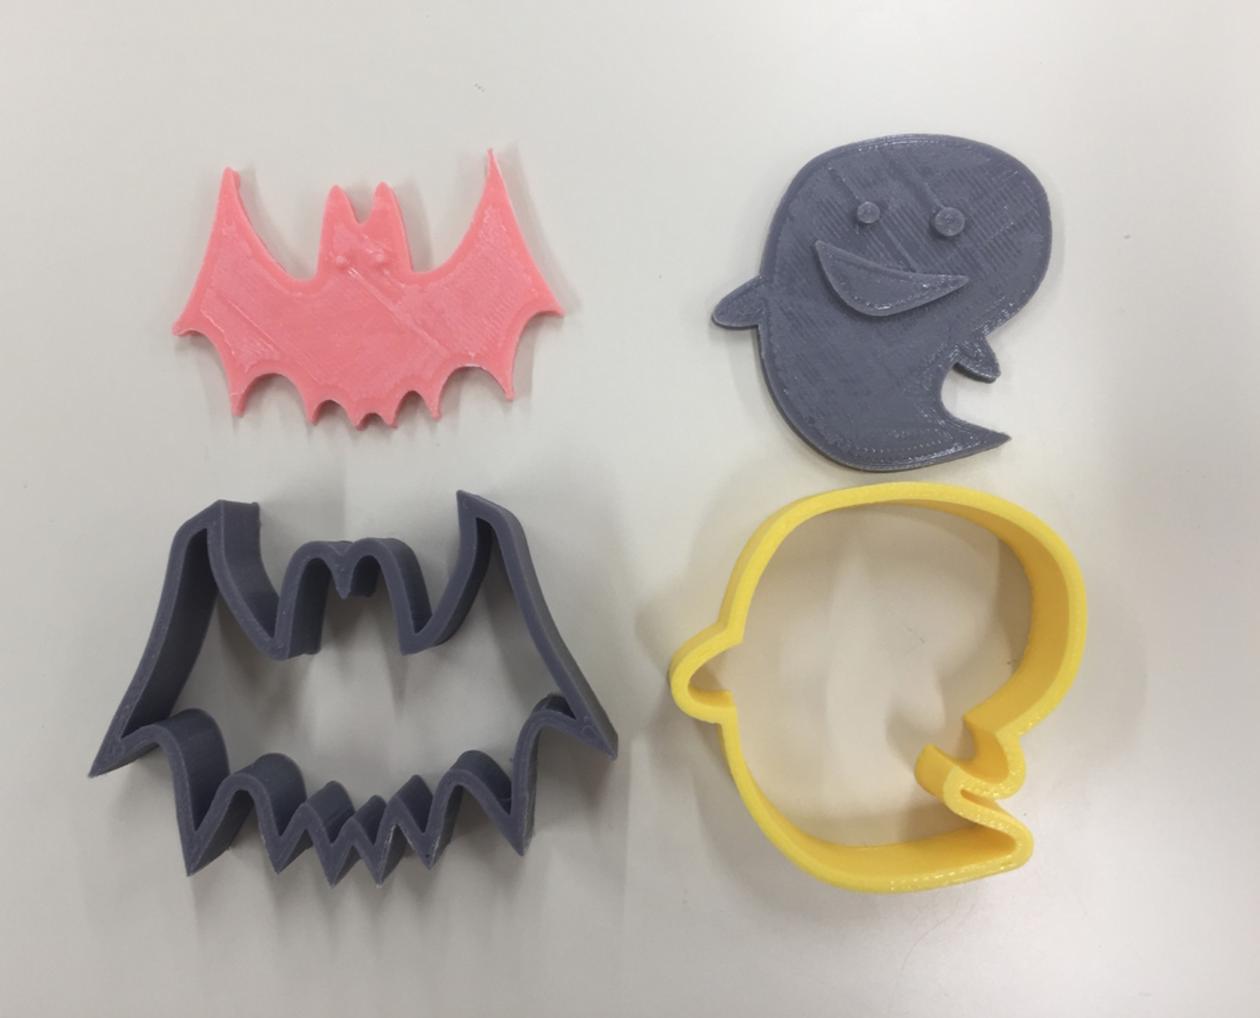 Capture d'écran 2016-10-17 à 09.54.59.png Download free STL file Halloween Cookie Cutter • Model to 3D print, Yuko